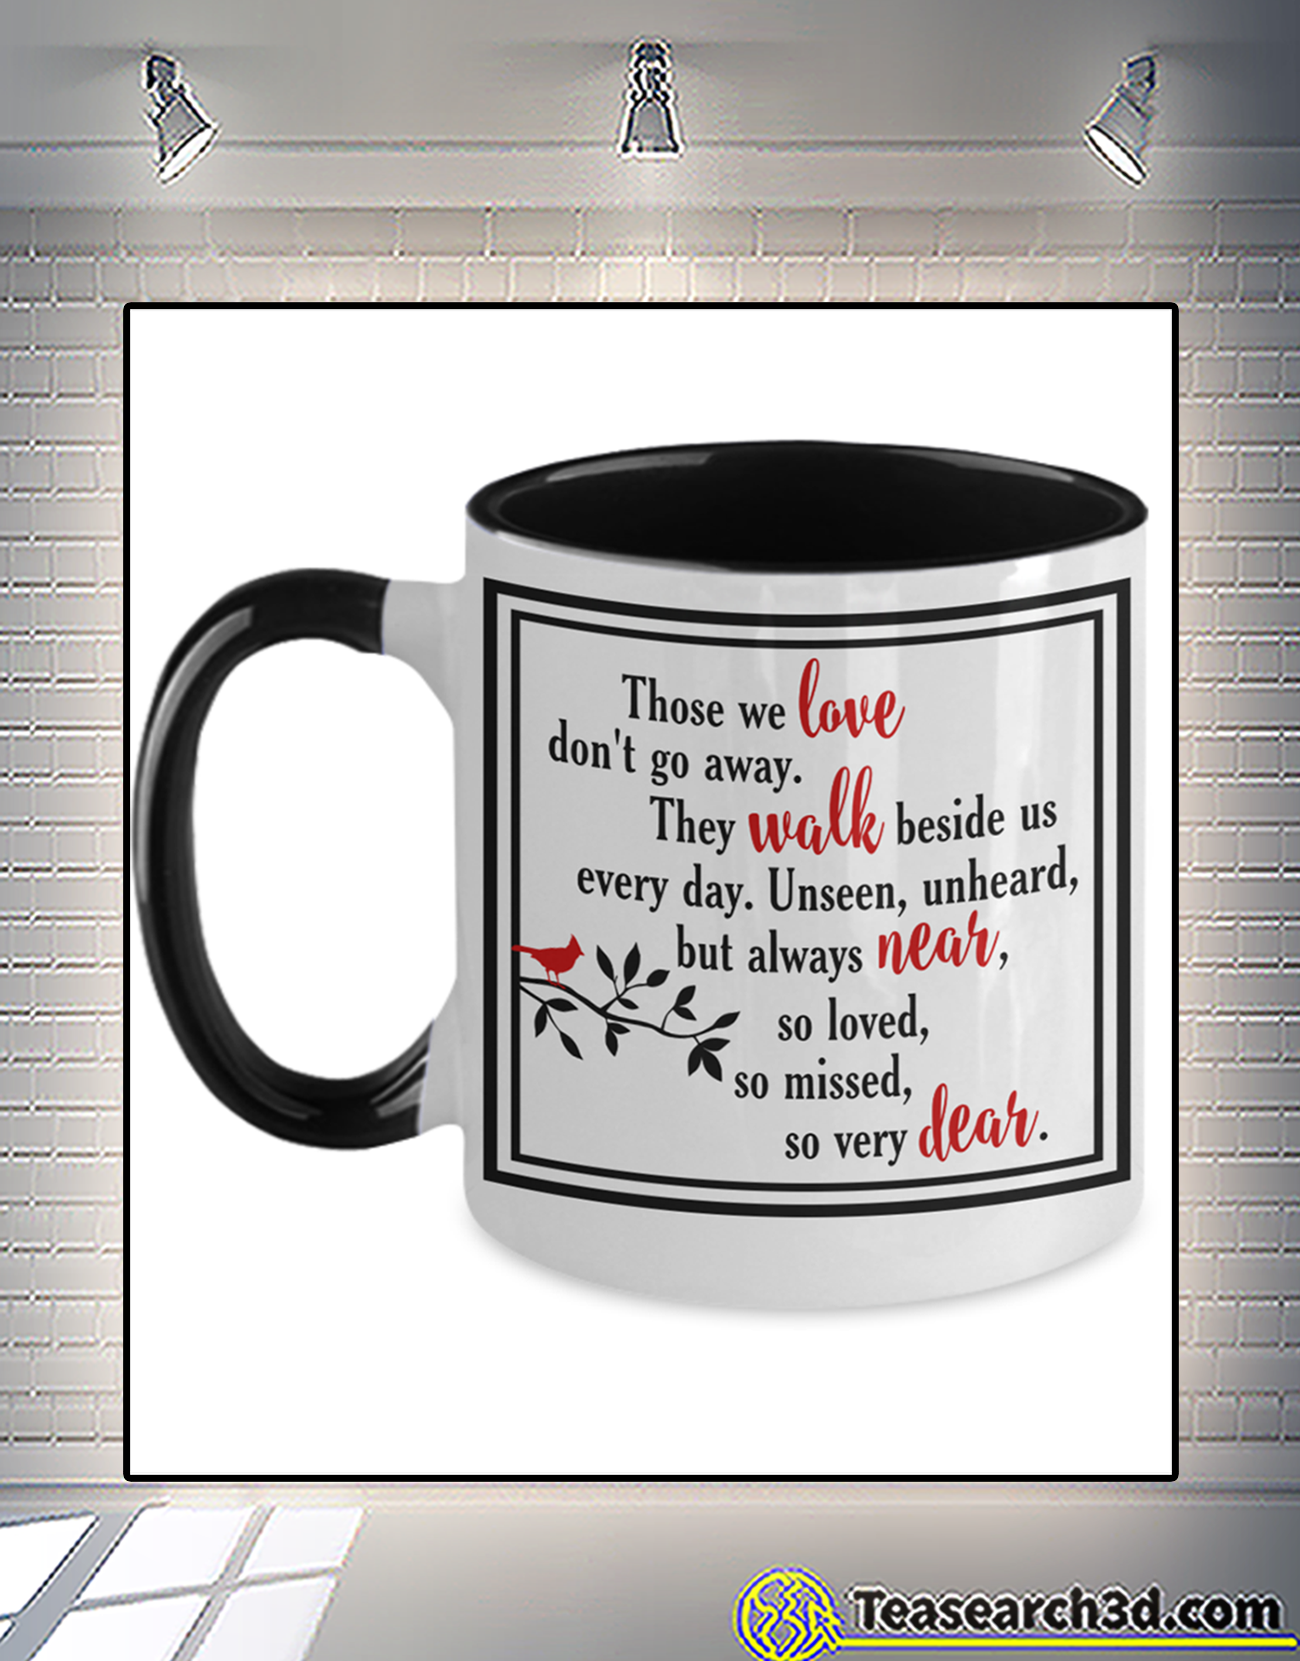 Cardinal those we love don't go away accent mug 1